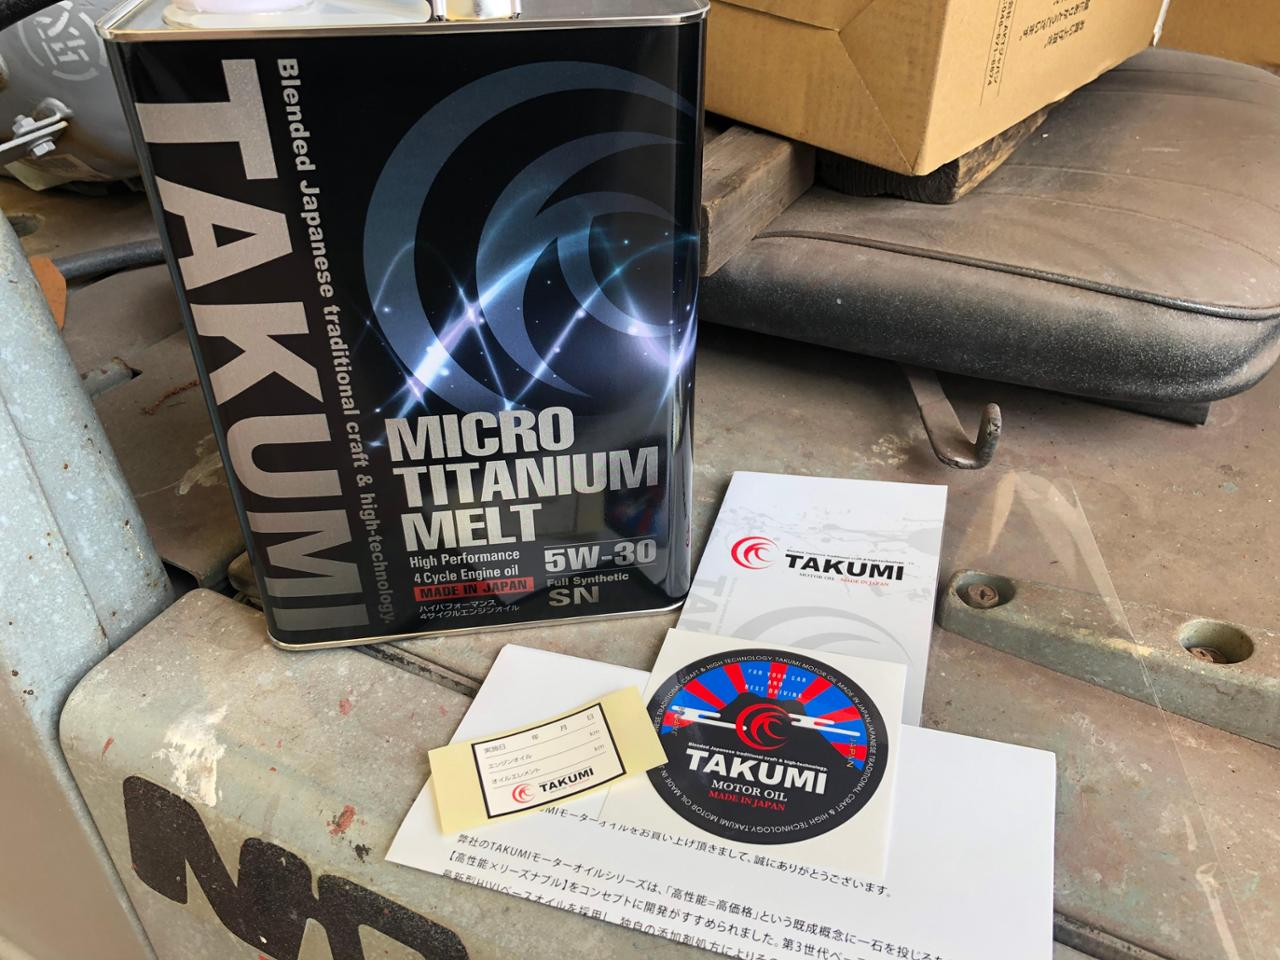 TAKUMIモーターオイル/AKTジャパン MICRO TITANIUM MELT 5W-30